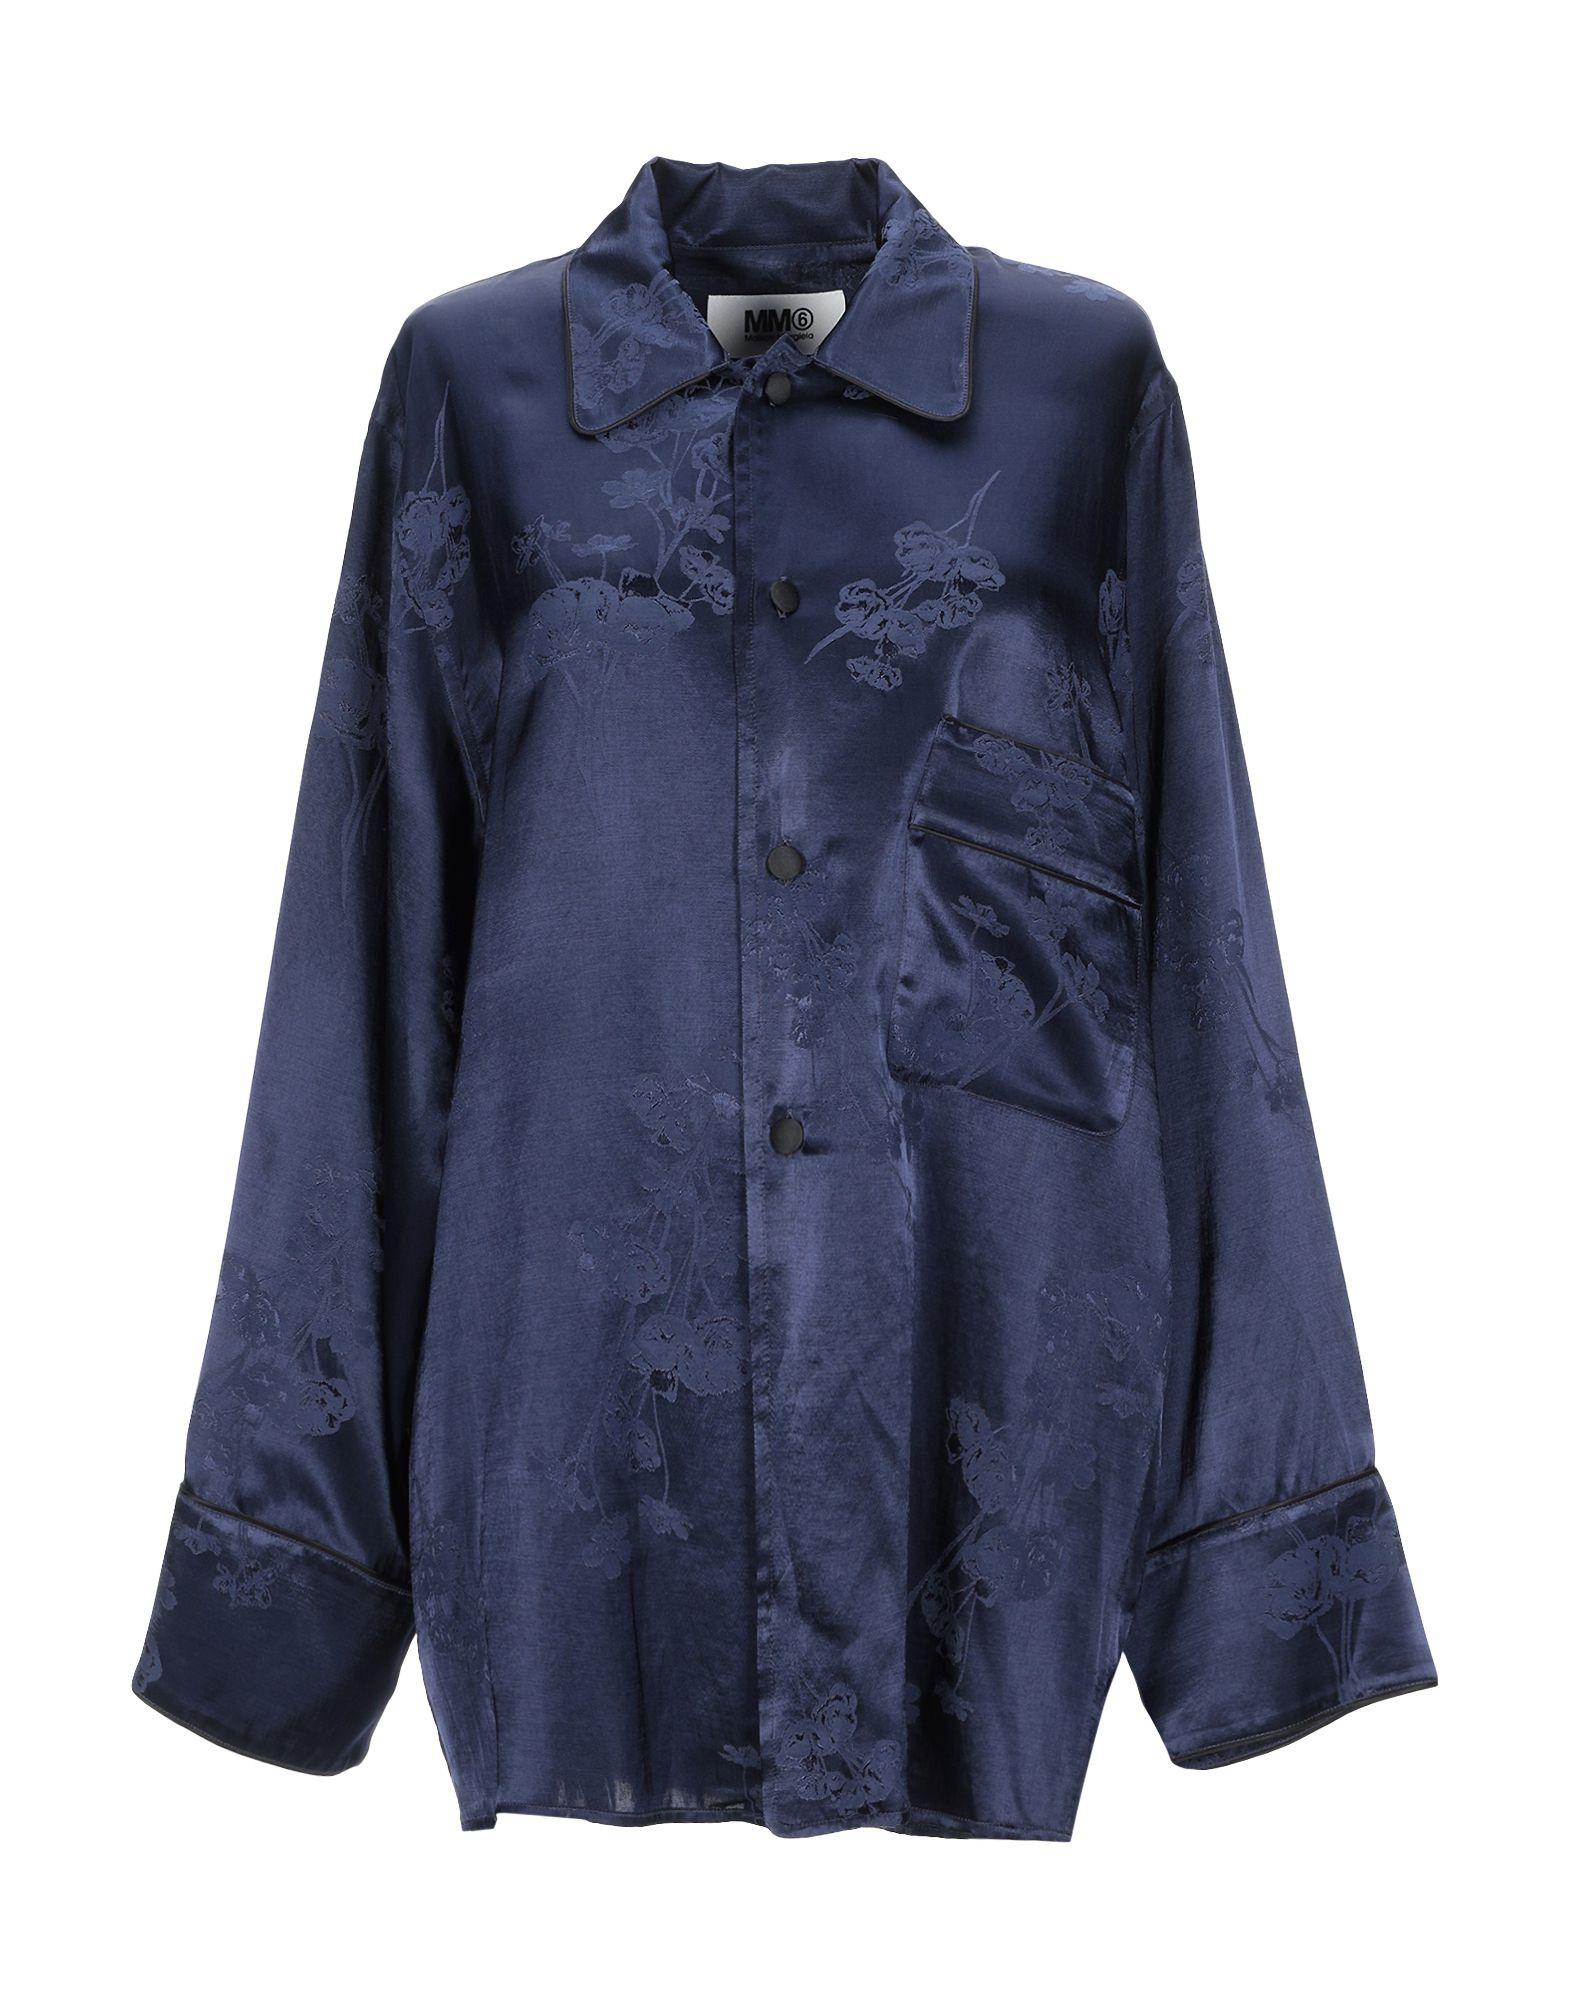 Camicie E bluse Tinta Unita Mm6 Maison Maison Maison Margiela donna - 38844885KG b05